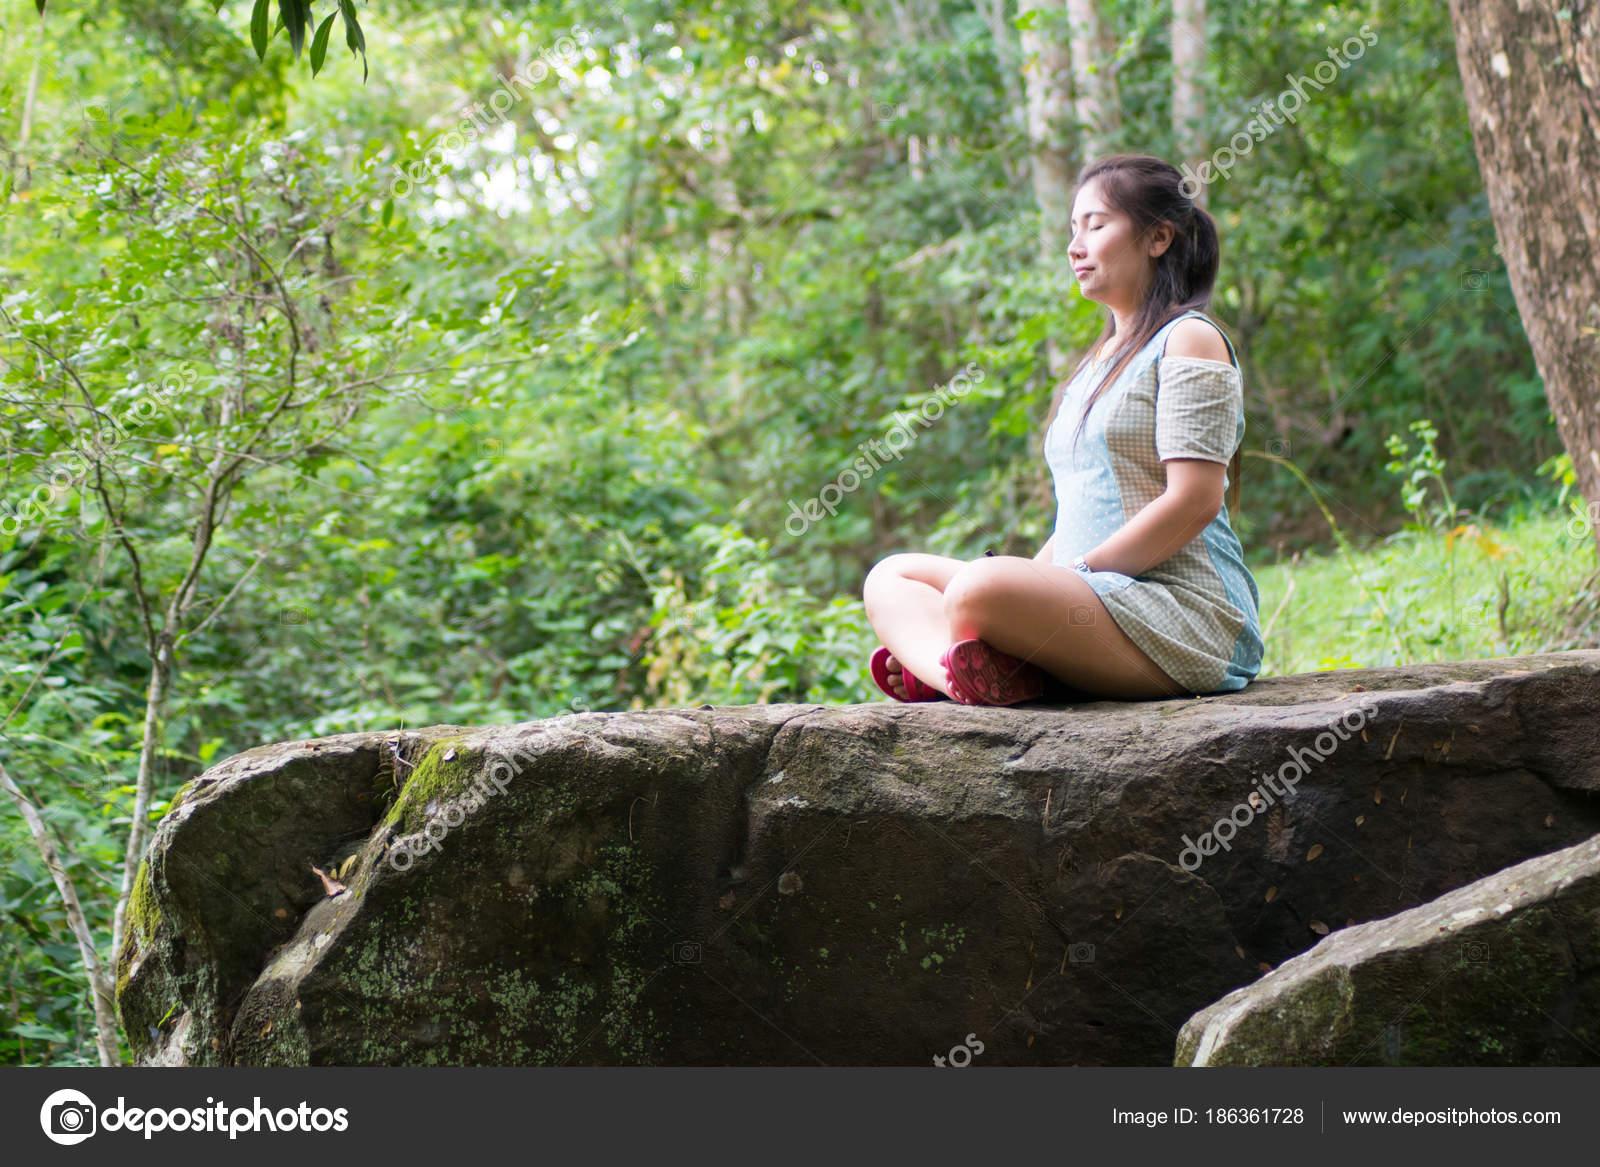 Meditation stock photo. Image of grass, lifestyle